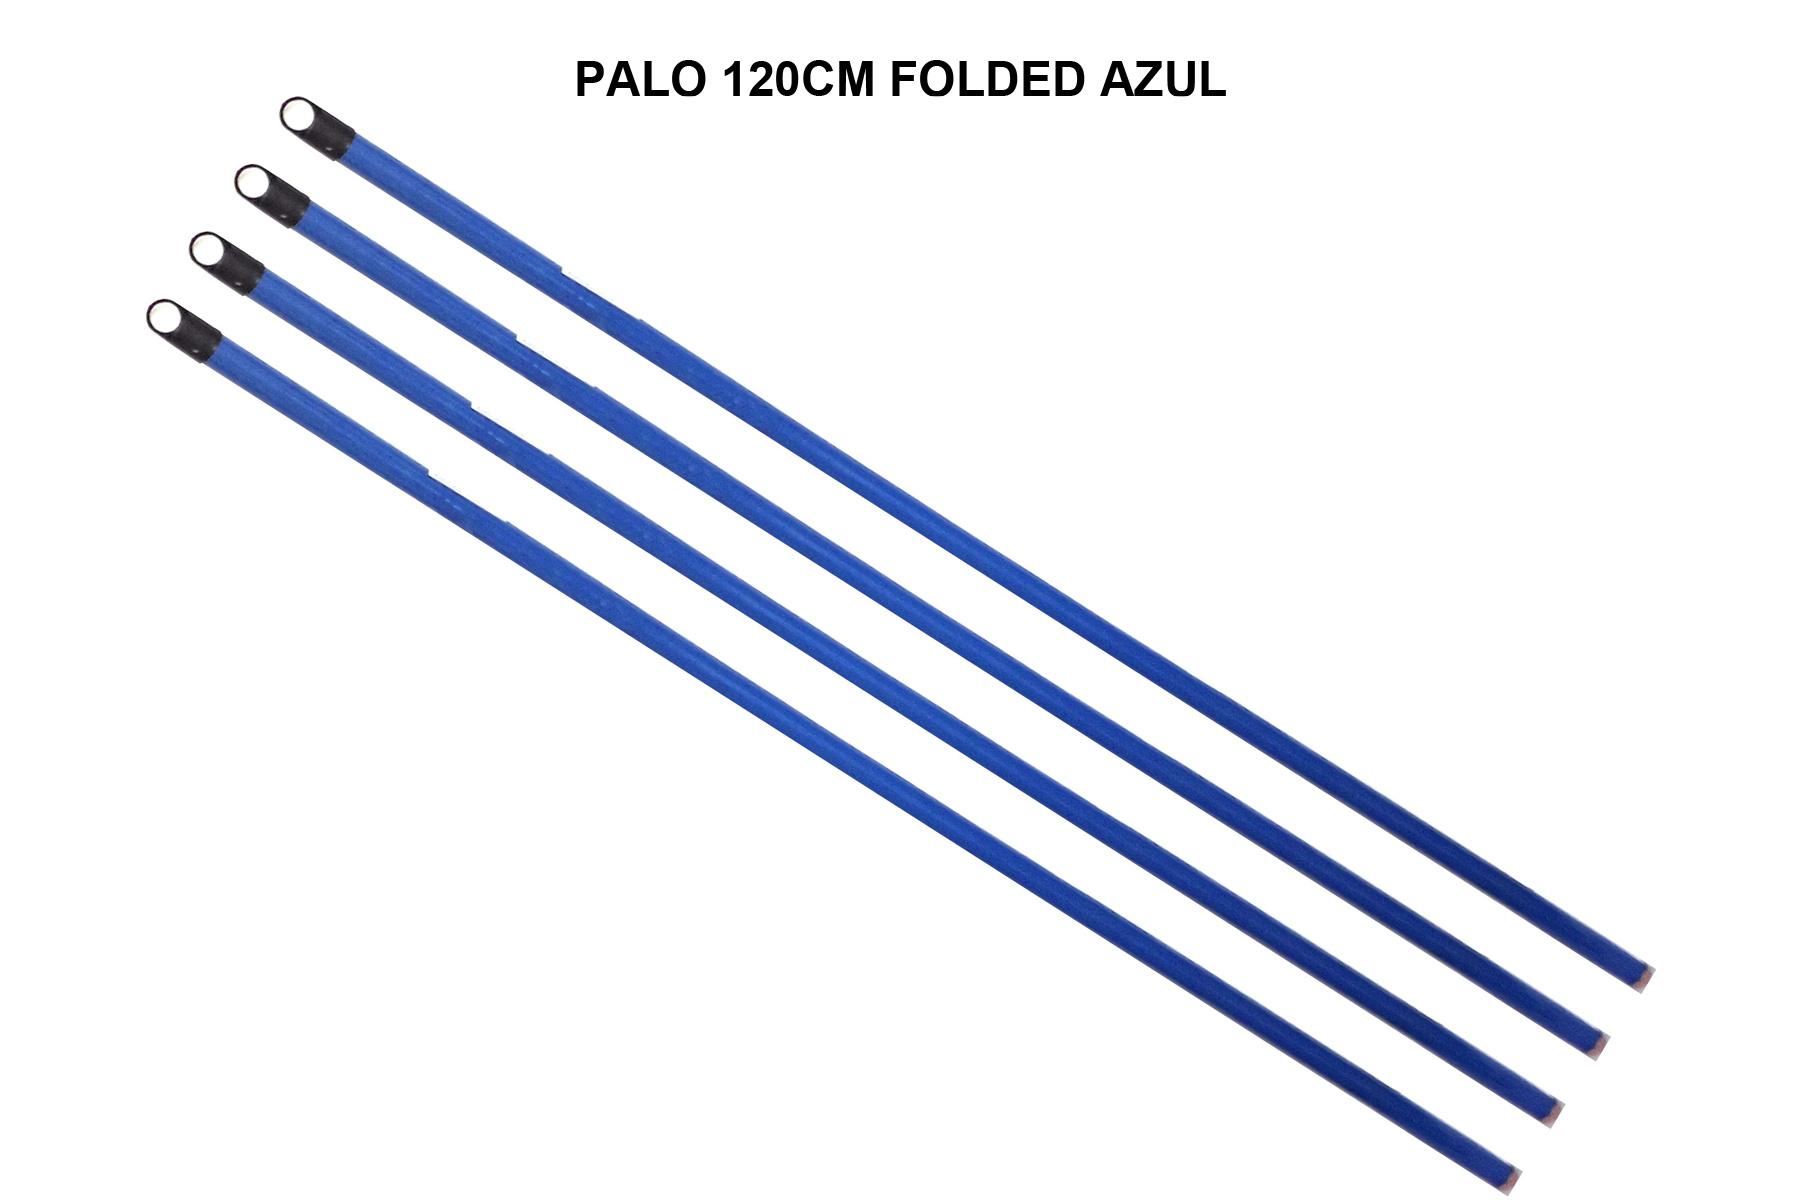 PALO 120CM FOLDED AZUL